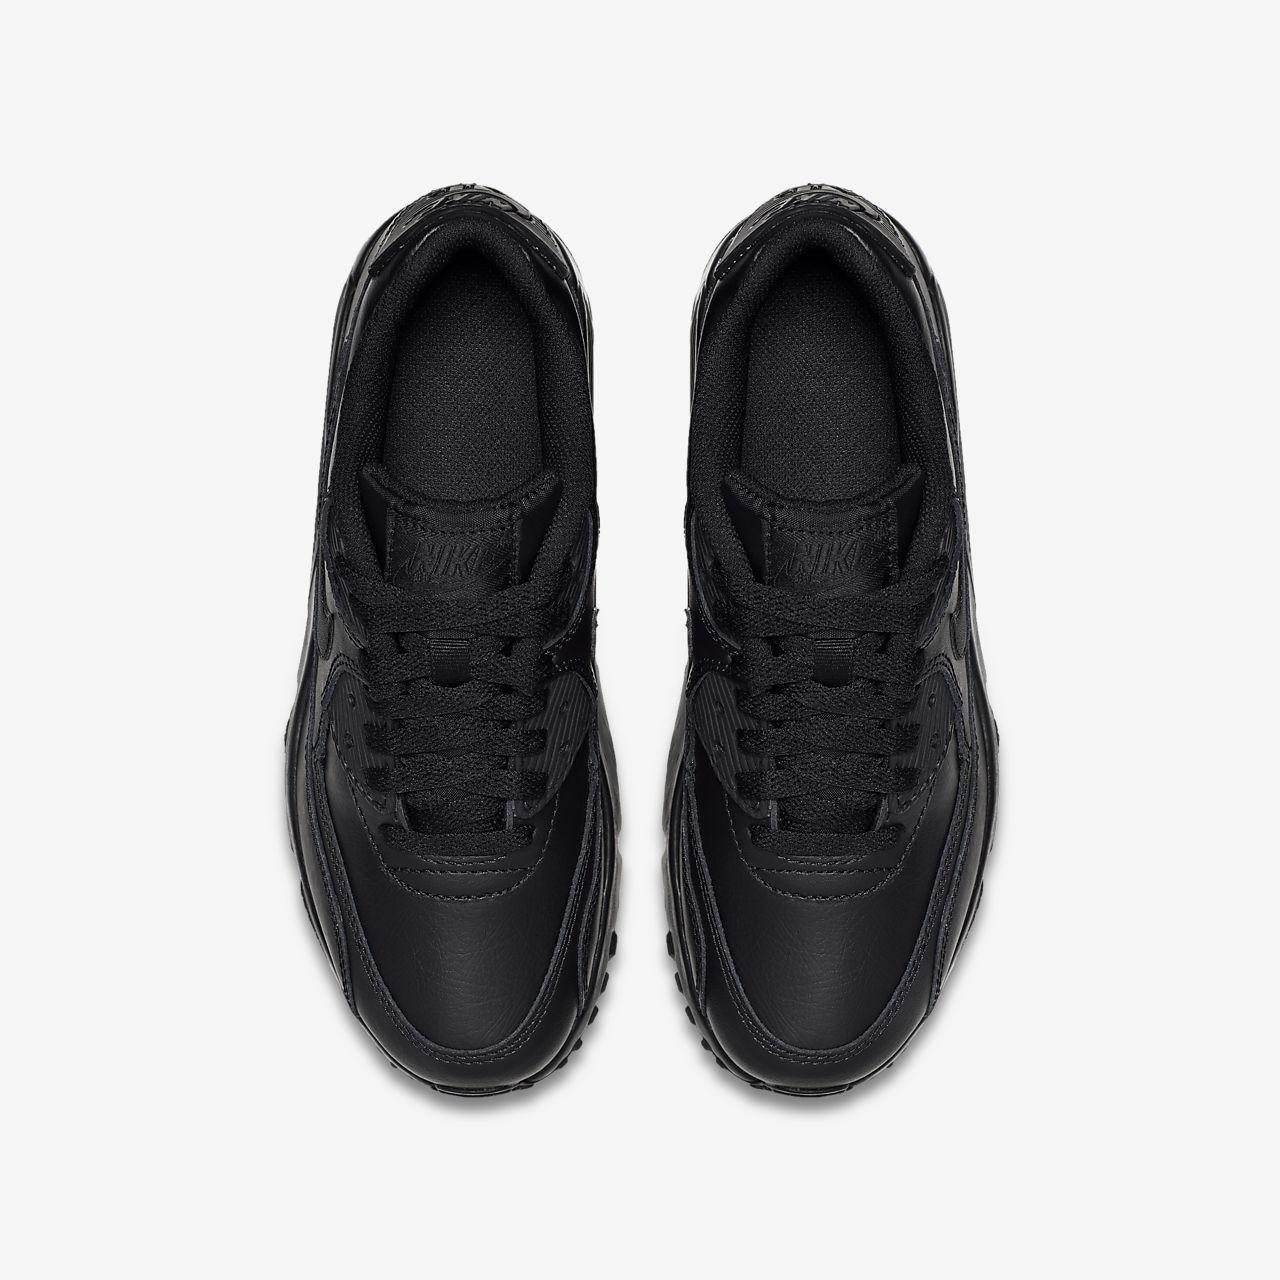 Nike Air Max 90 Leather Sneakers BlackBlack